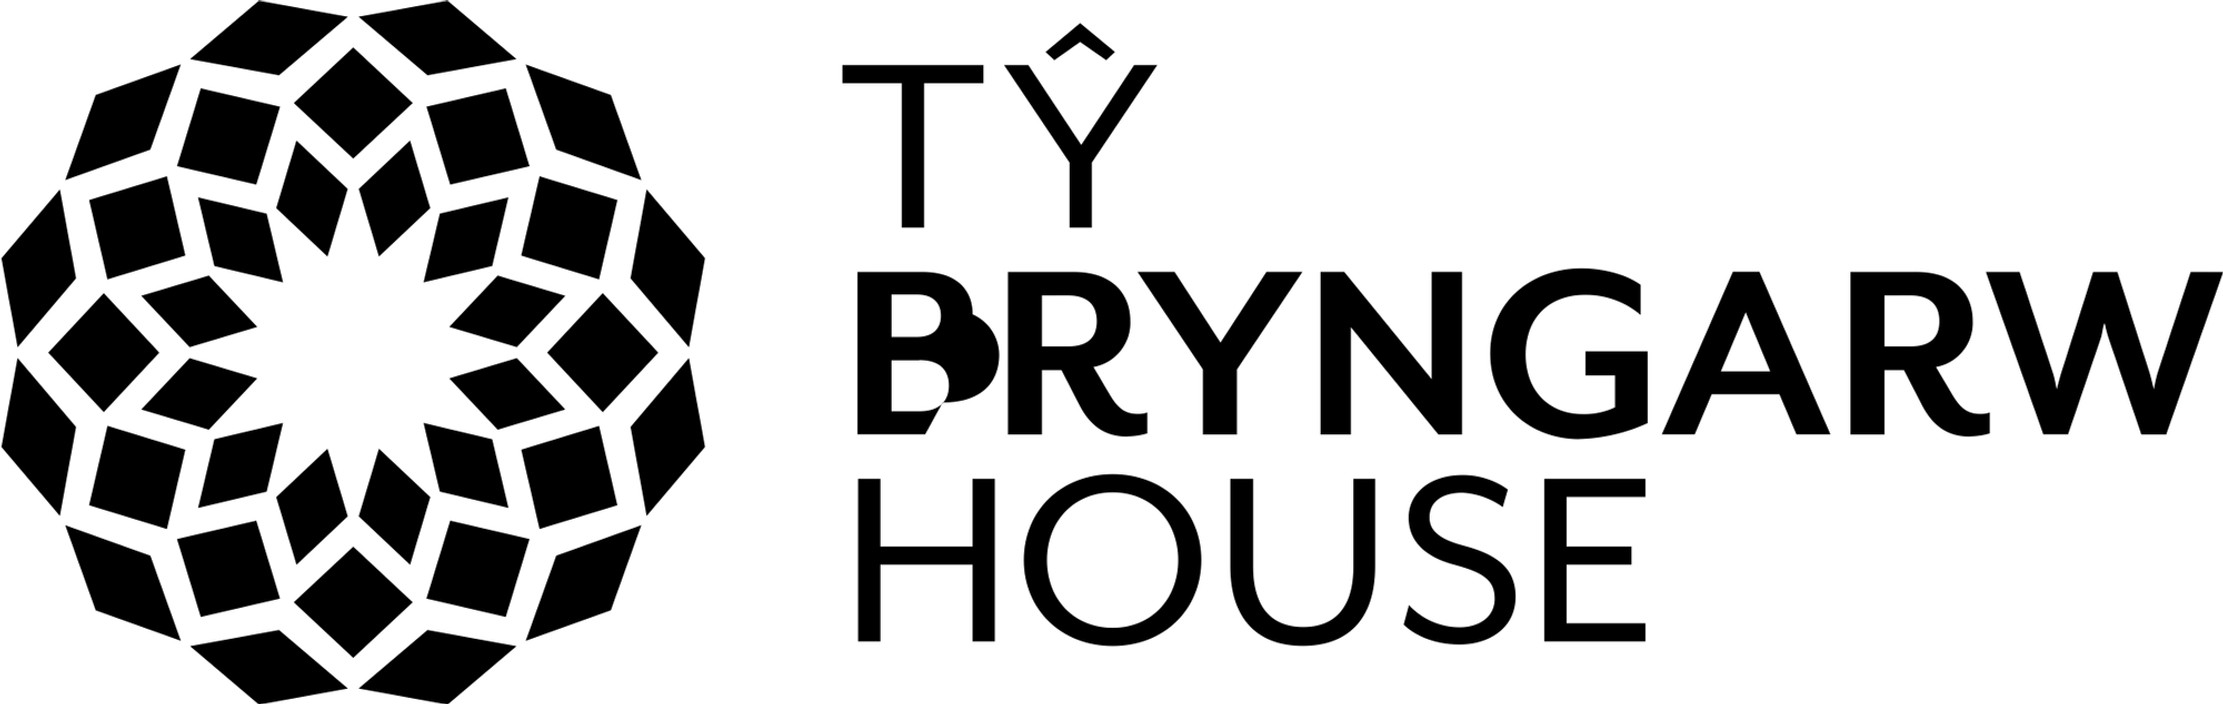 bryngarw house.jpg